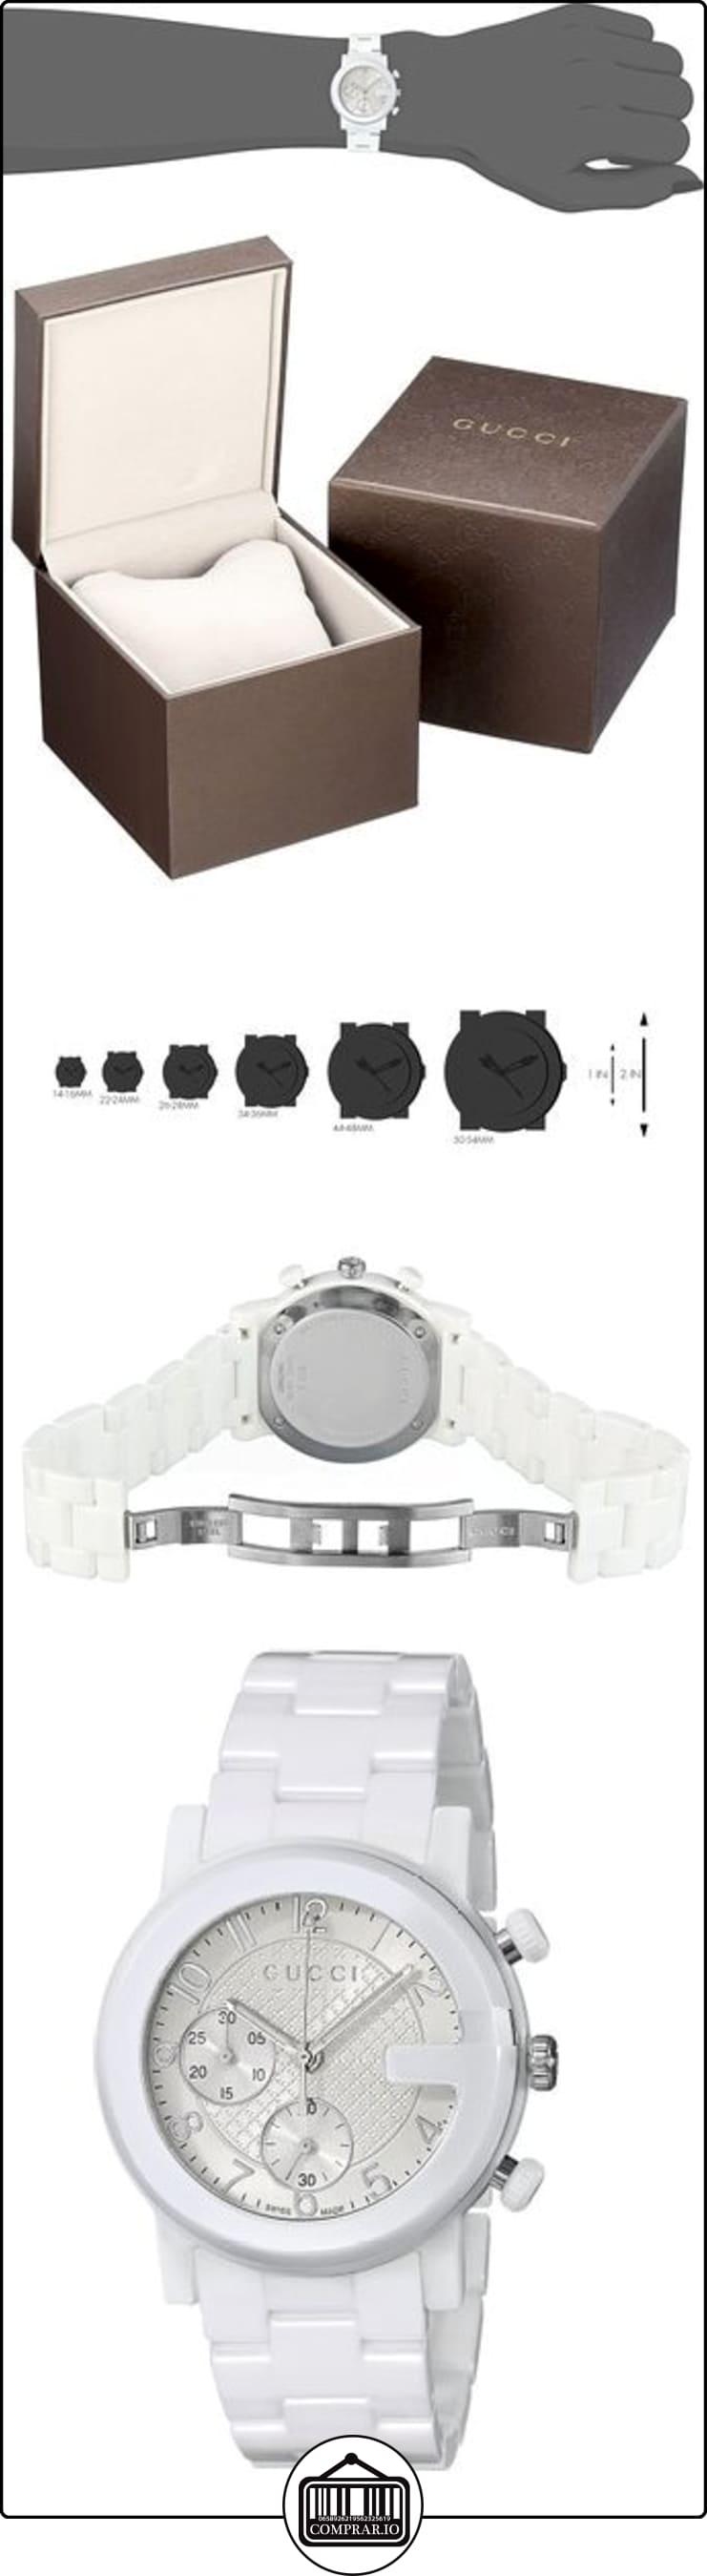 616760bcc436 relojes hombre lg